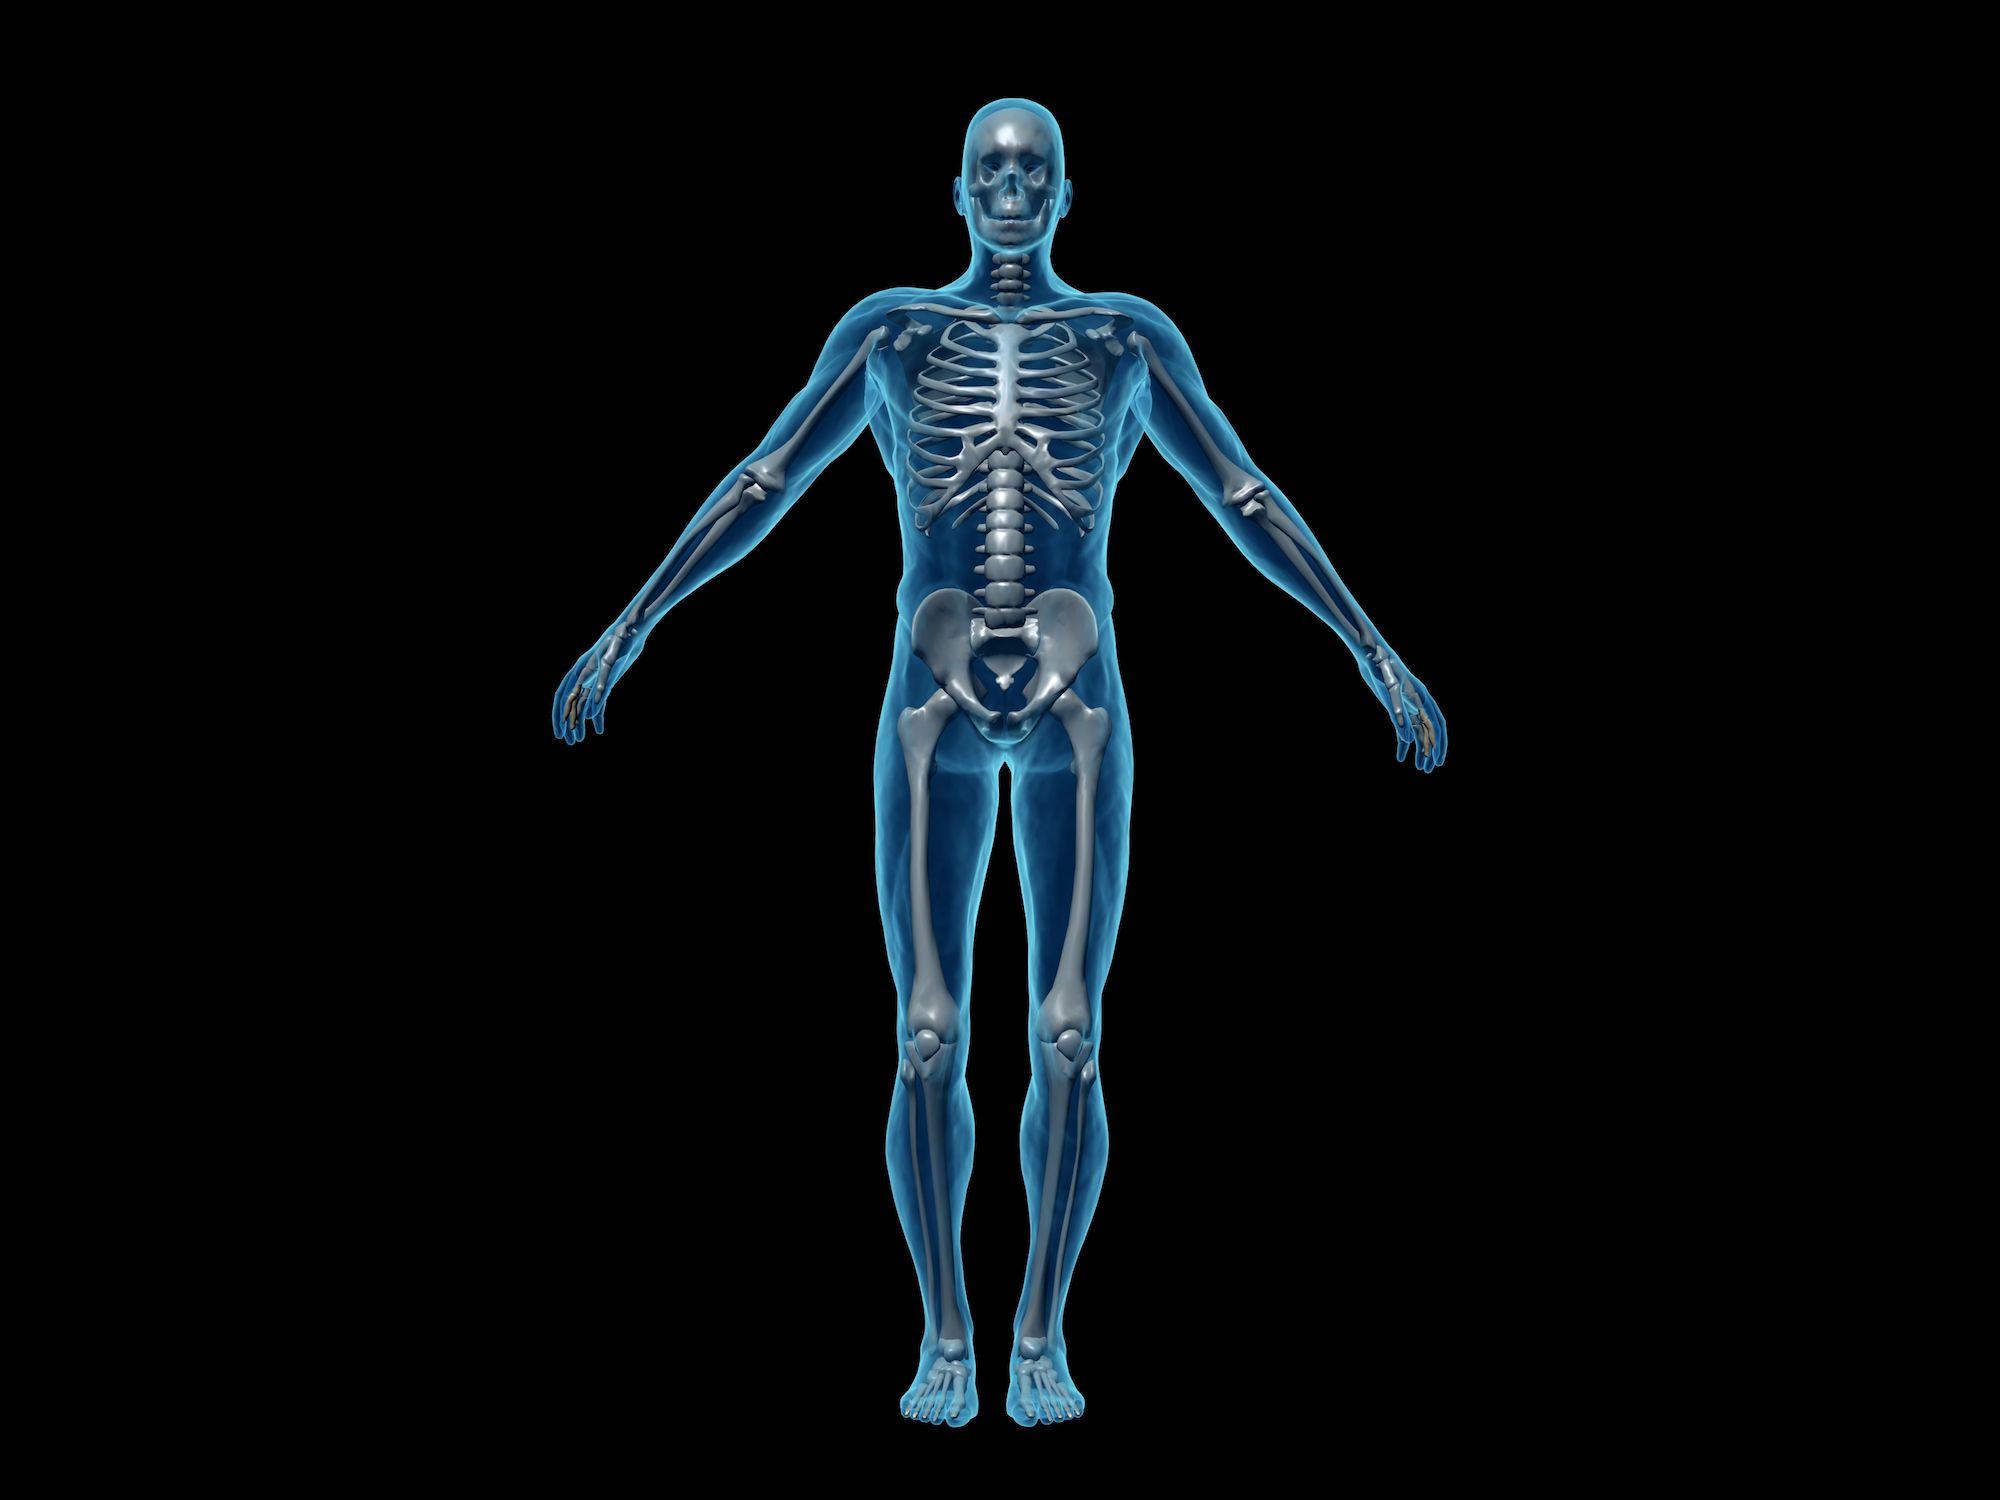 Vital Statistics Of The Male Human Body